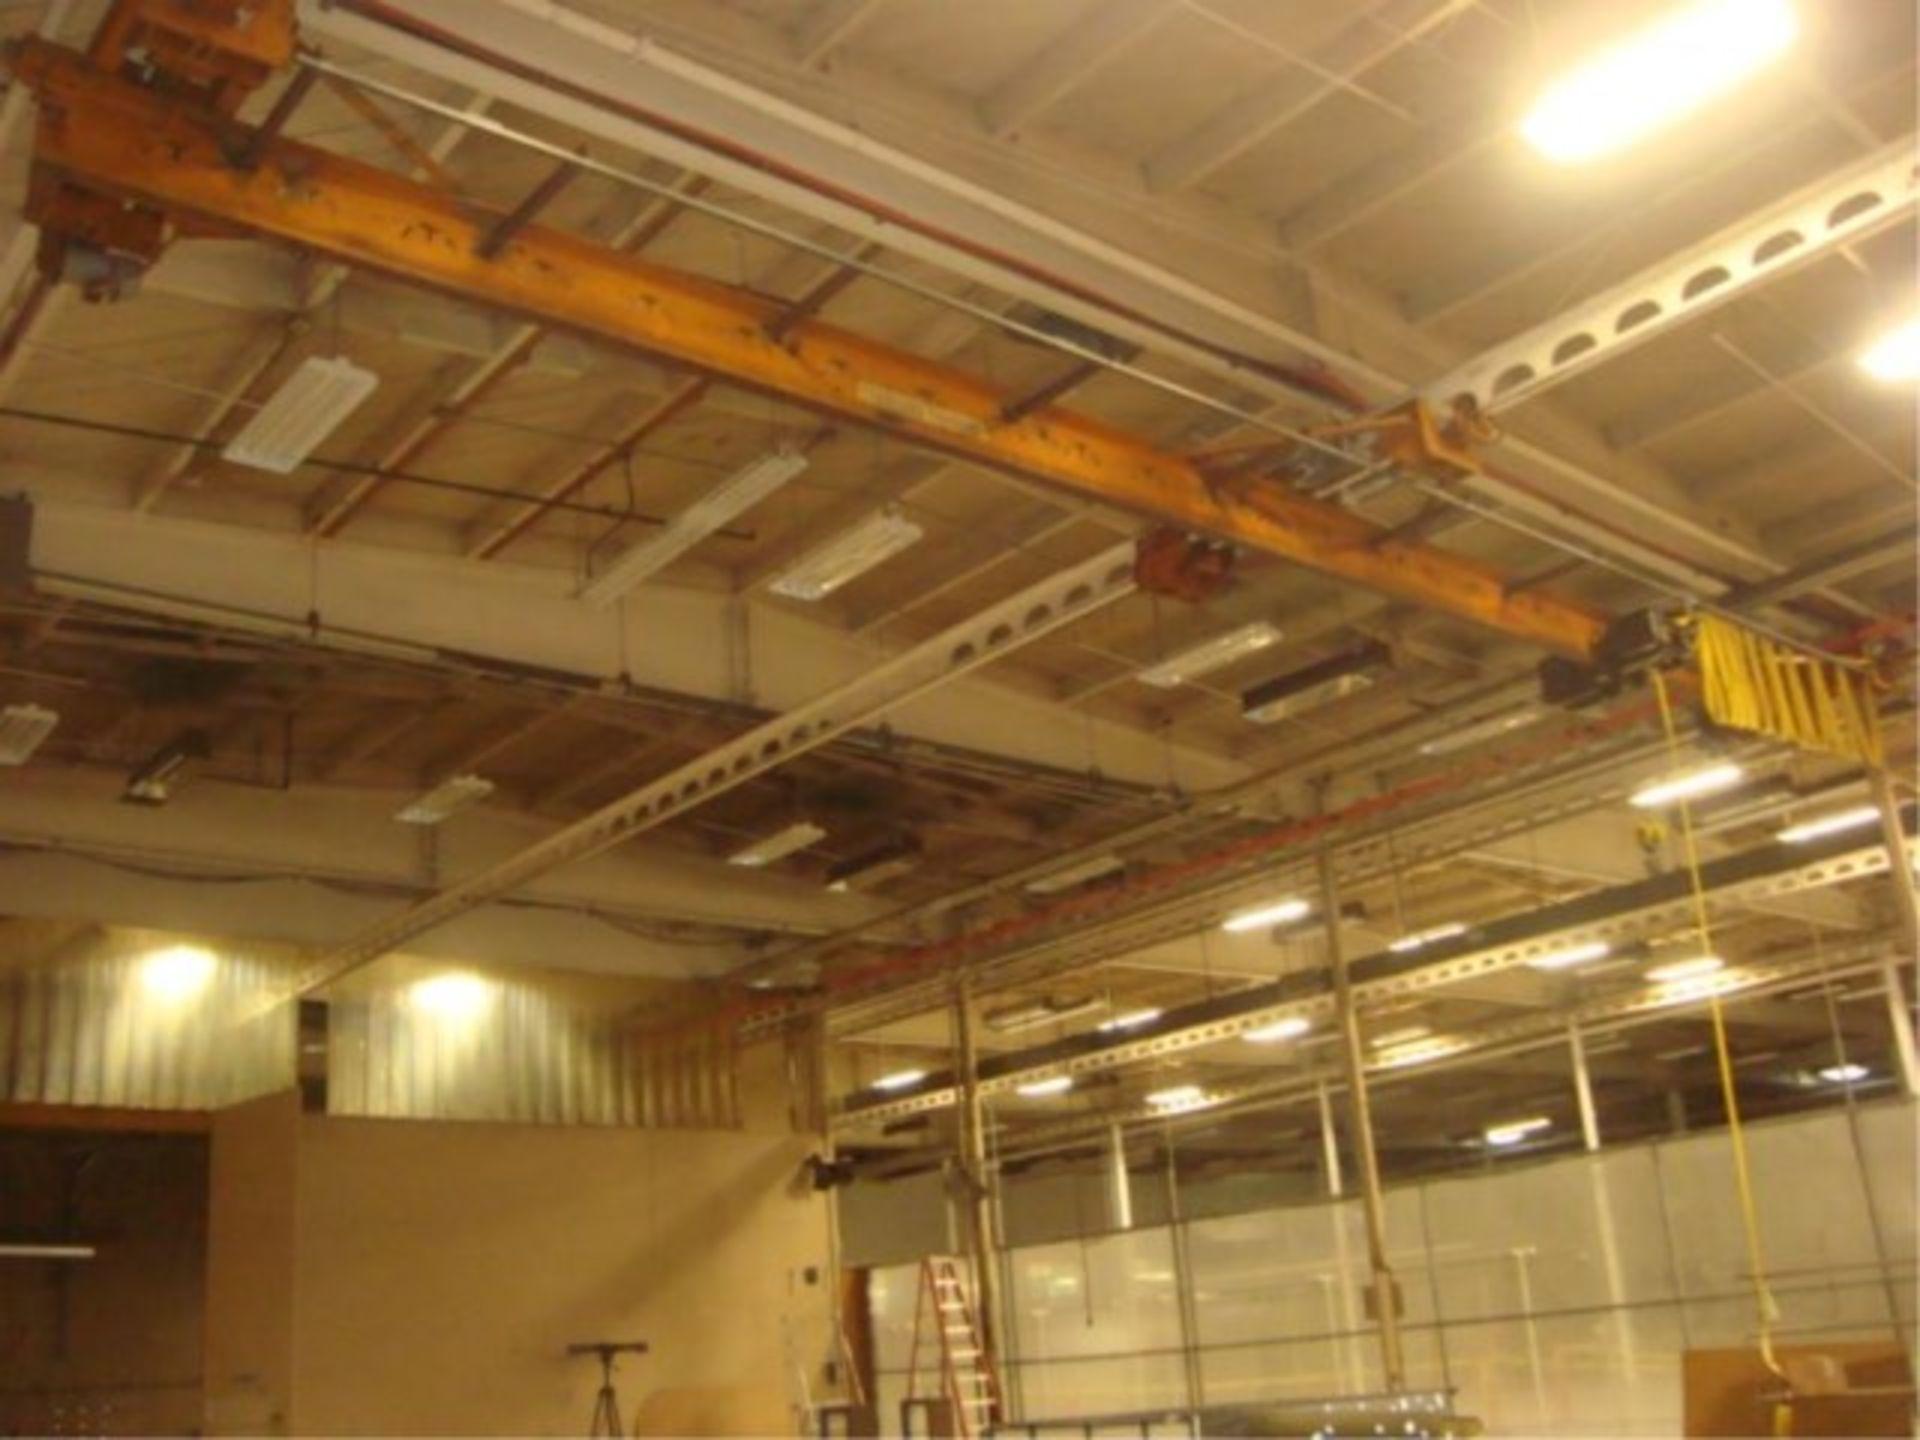 Lot 108 - 2-Ton Capacity Overhead Bridge Crane